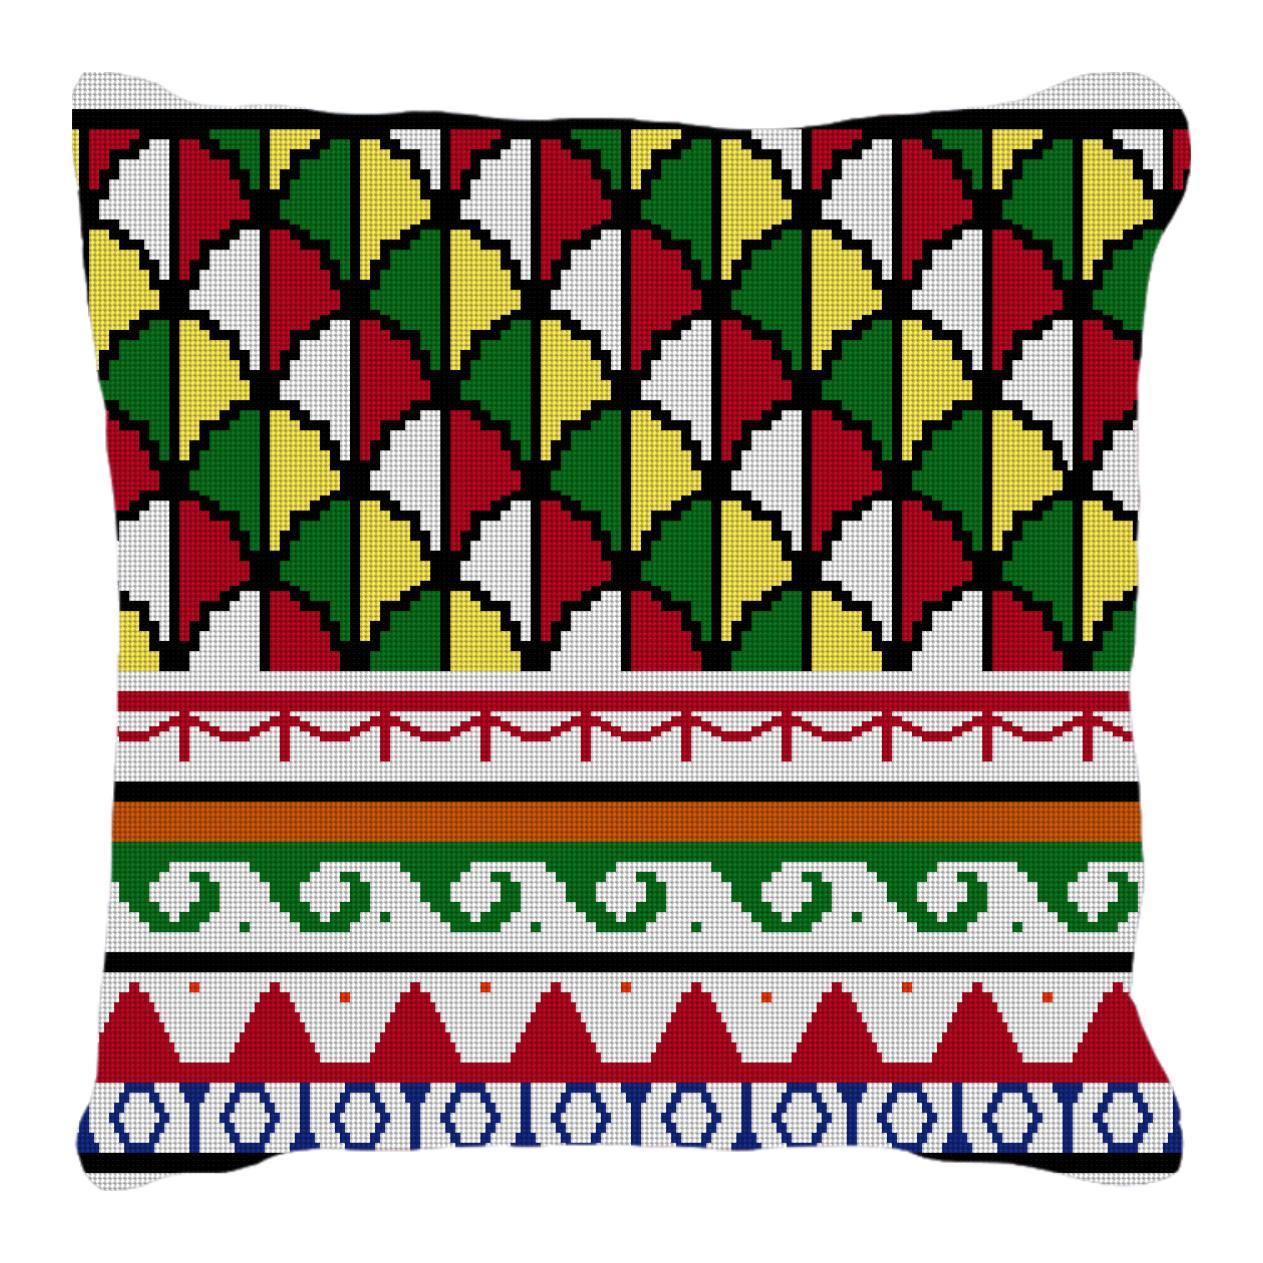 Polychrome Mosaic Needlepoint Pillow